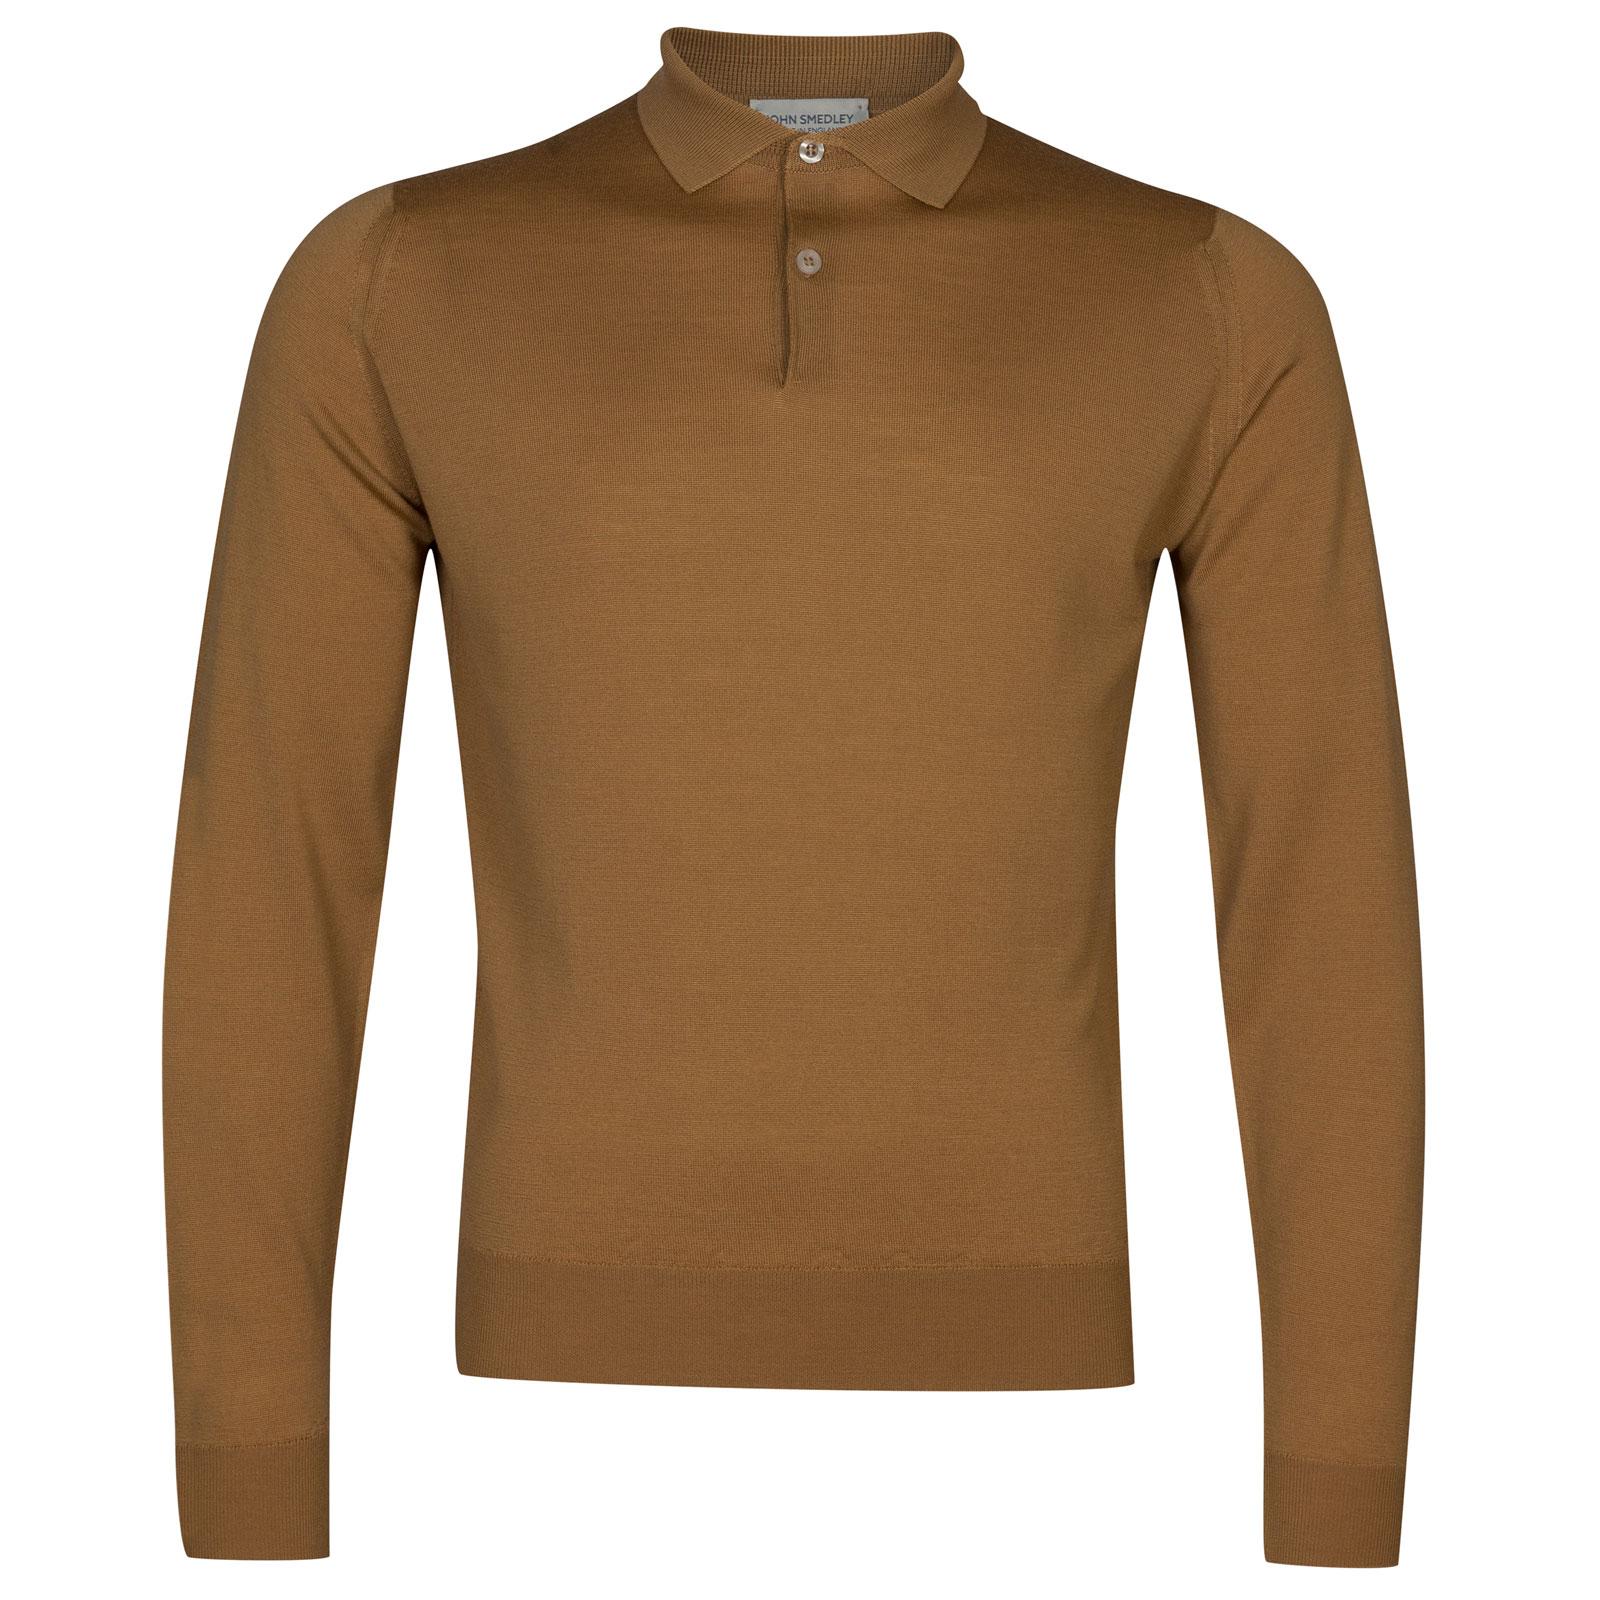 John Smedley garda Merino Wool Shirt in Camel-L